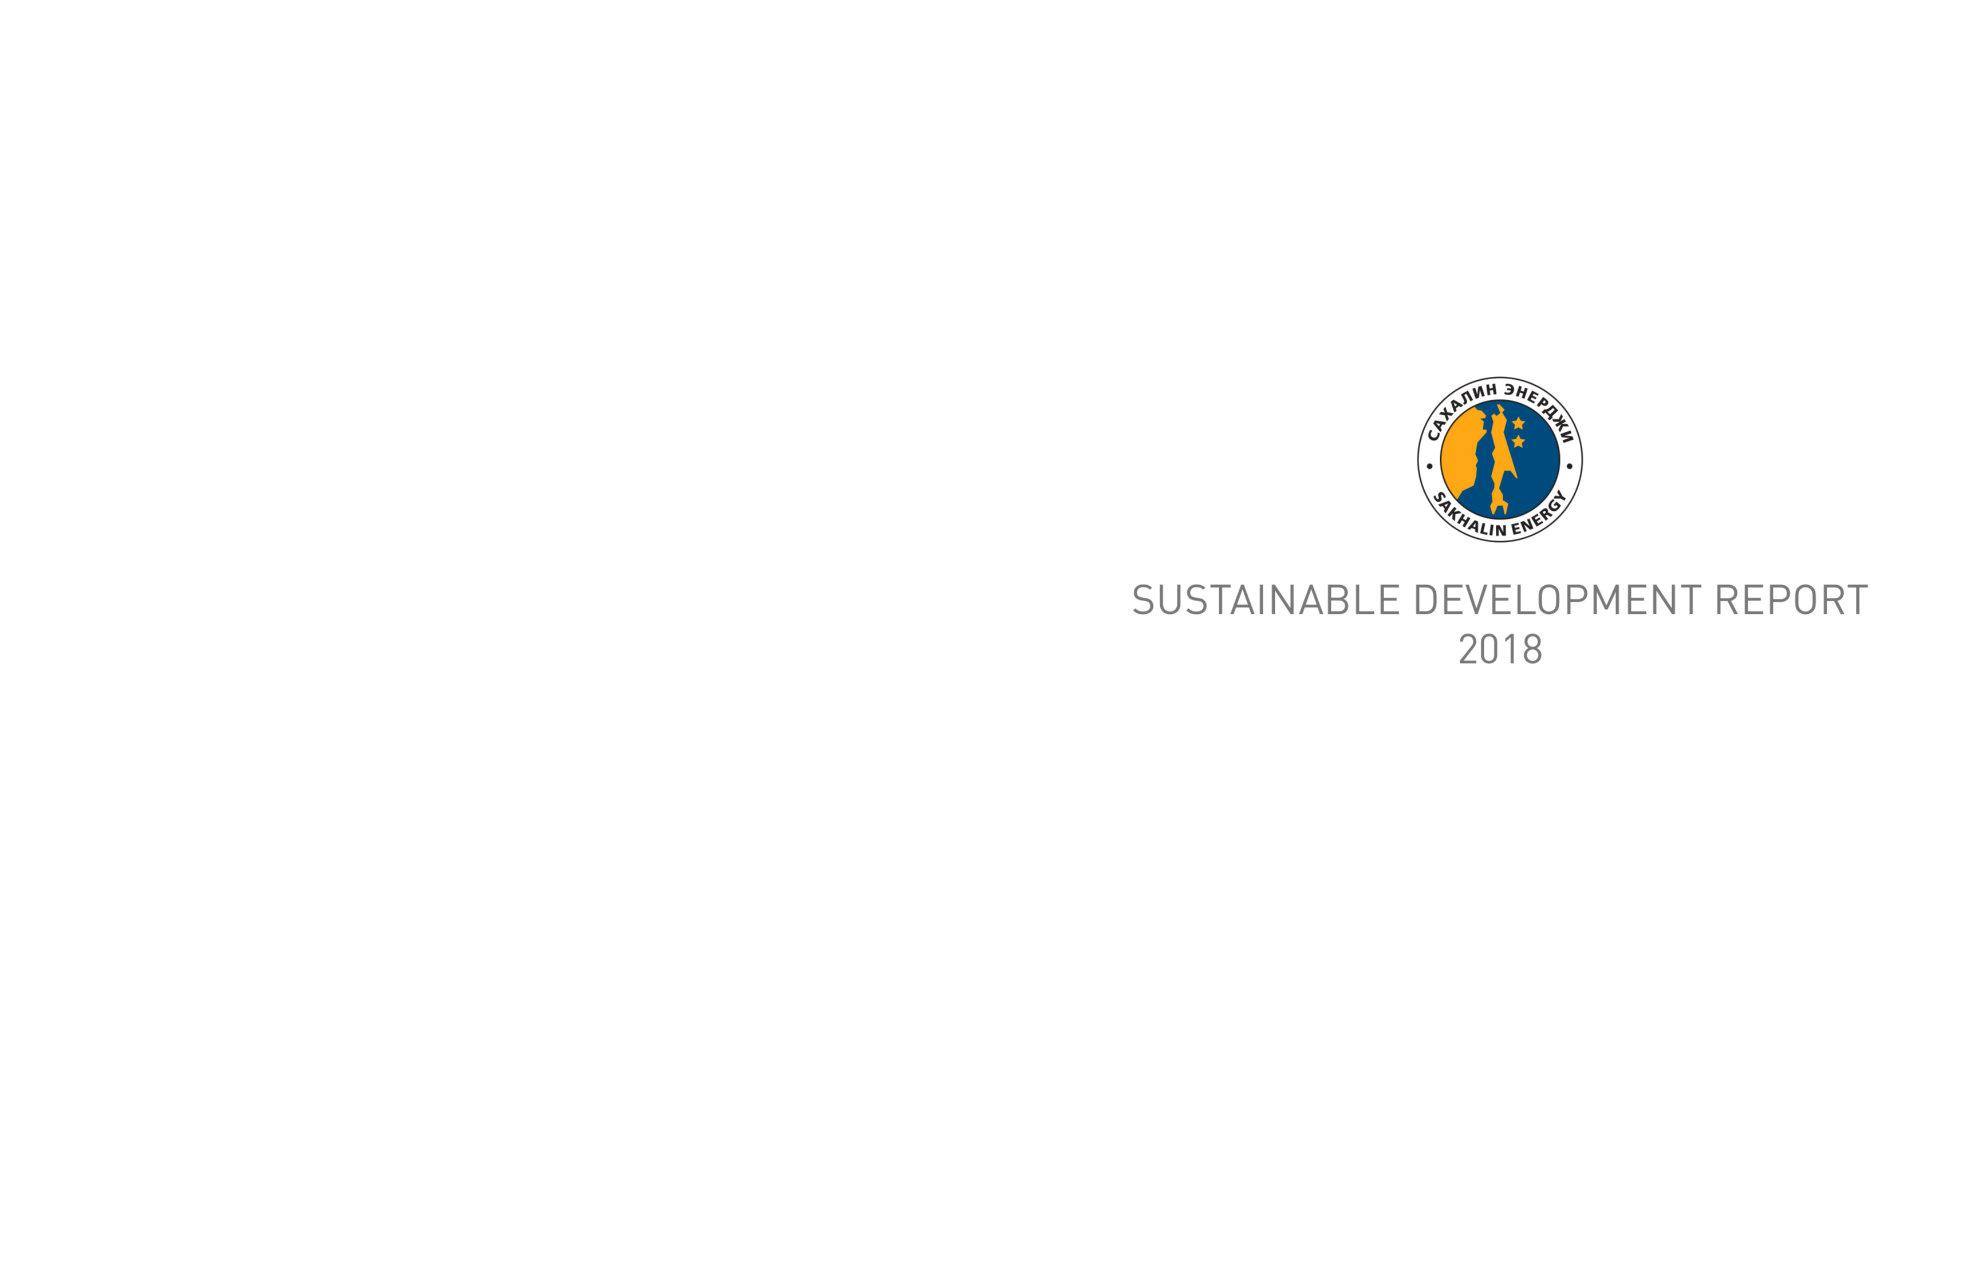 Sakhalin energy investment bpi investment fund pinoyexchange celebrity